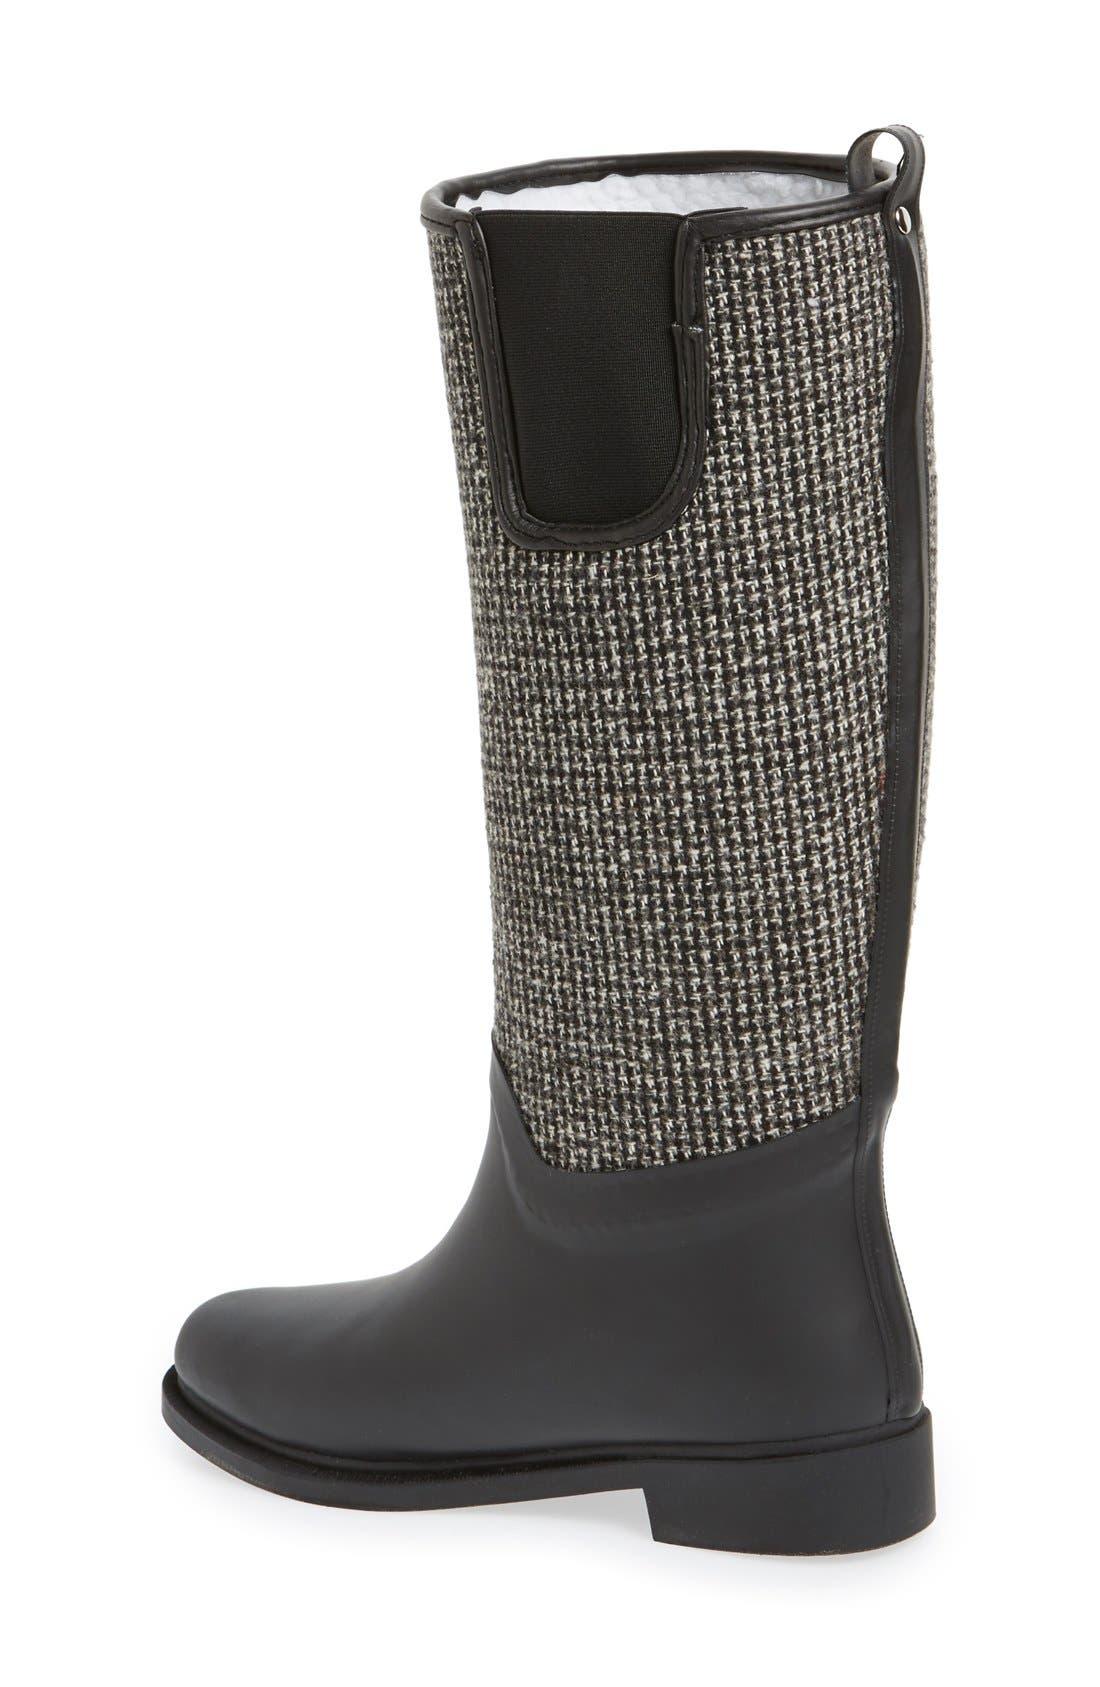 DÄV, Cardiff Tweed Knee High Waterproof Rain Boot, Alternate thumbnail 4, color, BLACK